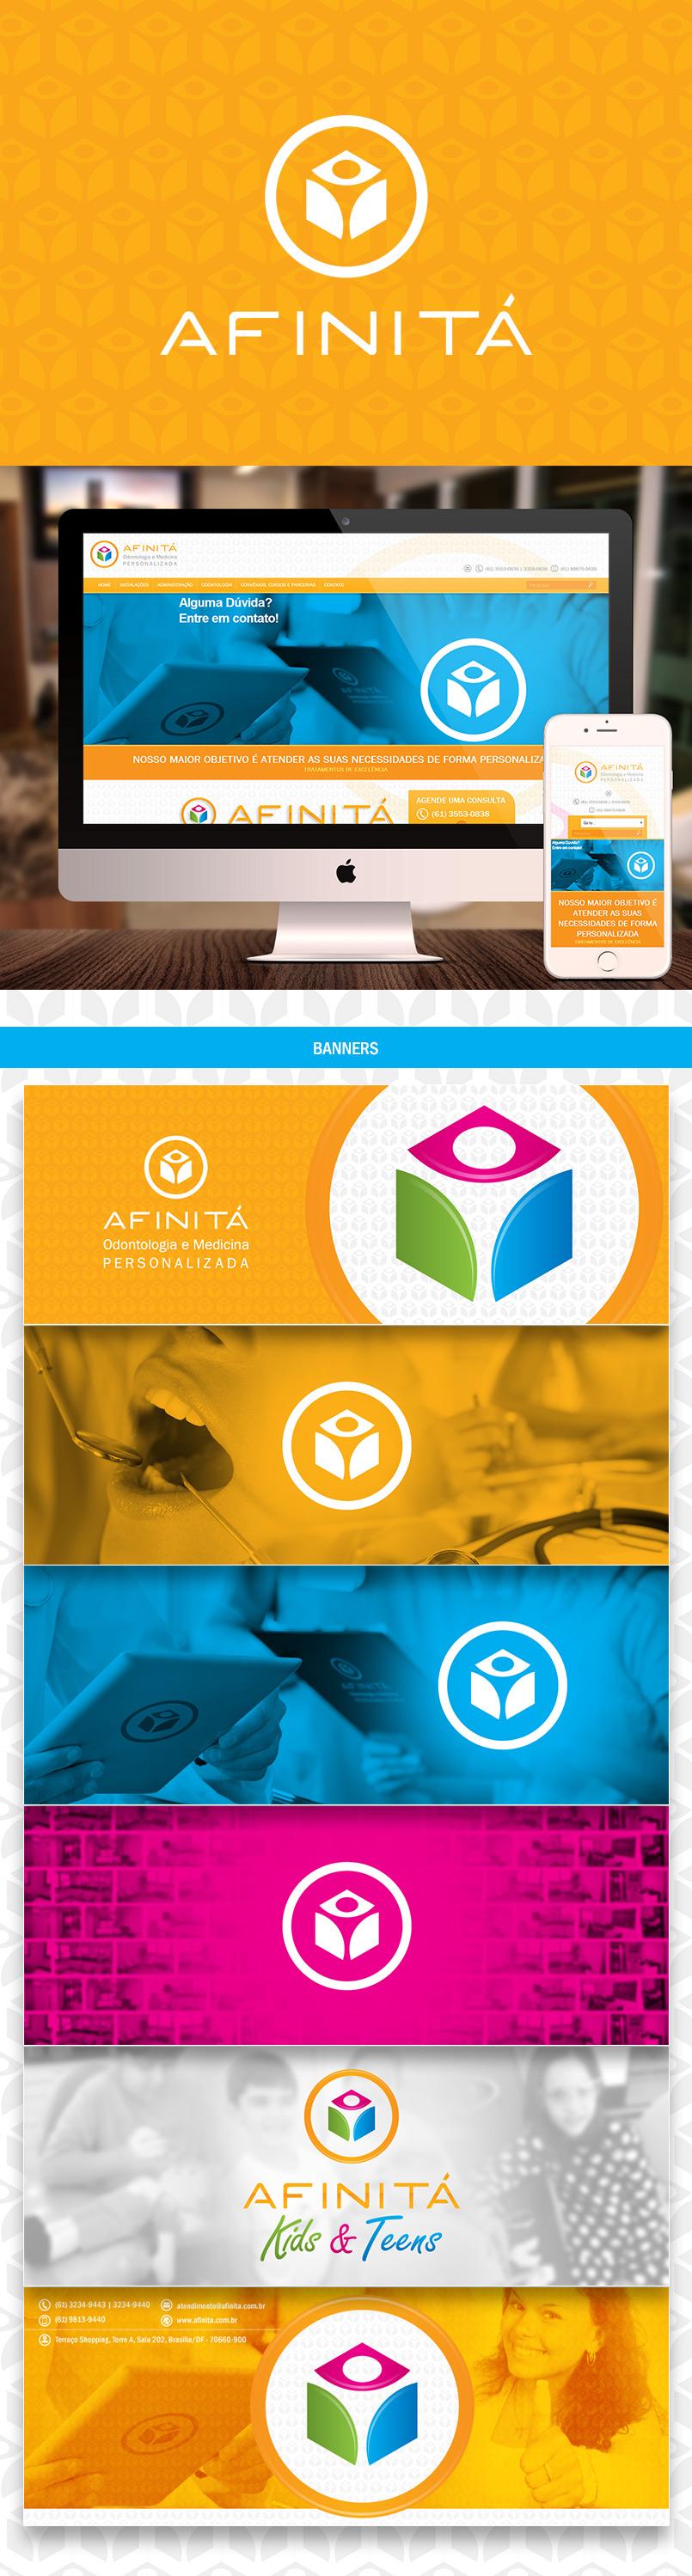 APRESENTACAO-site-institucional-blog-area-restrita-afinita-1